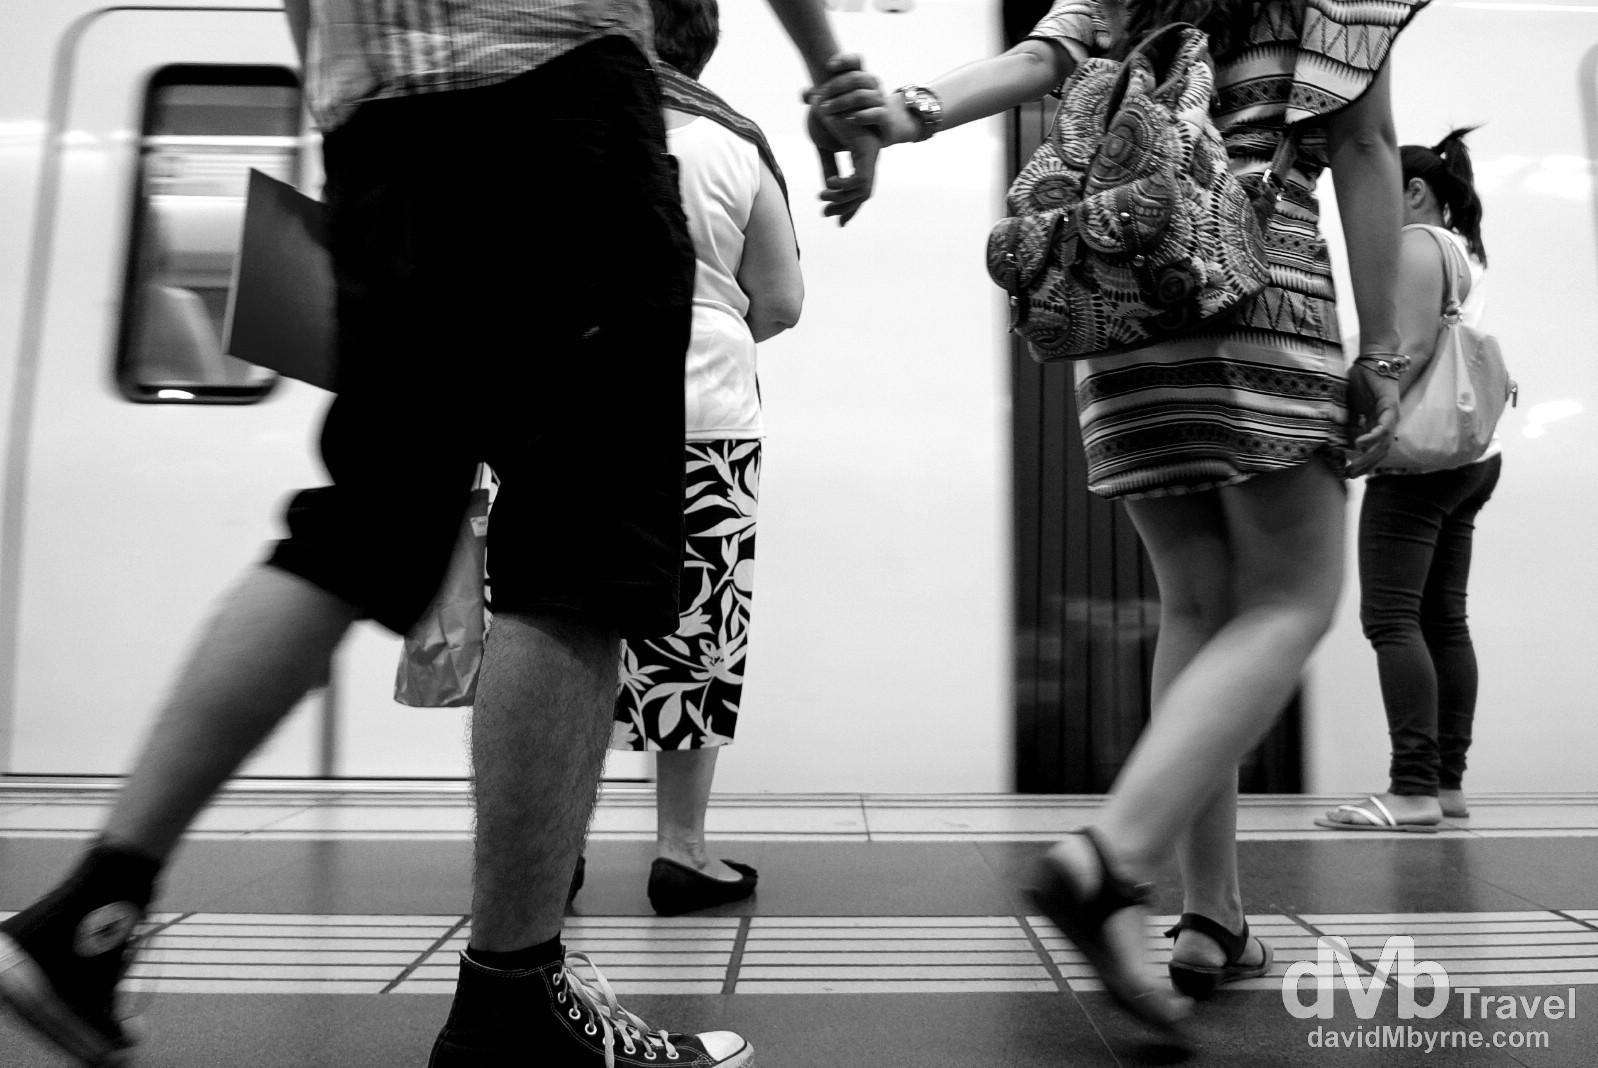 On the platform of Diagonal Metro Station in Barcelona, Catalonia, Spain. June 18th, 2014.